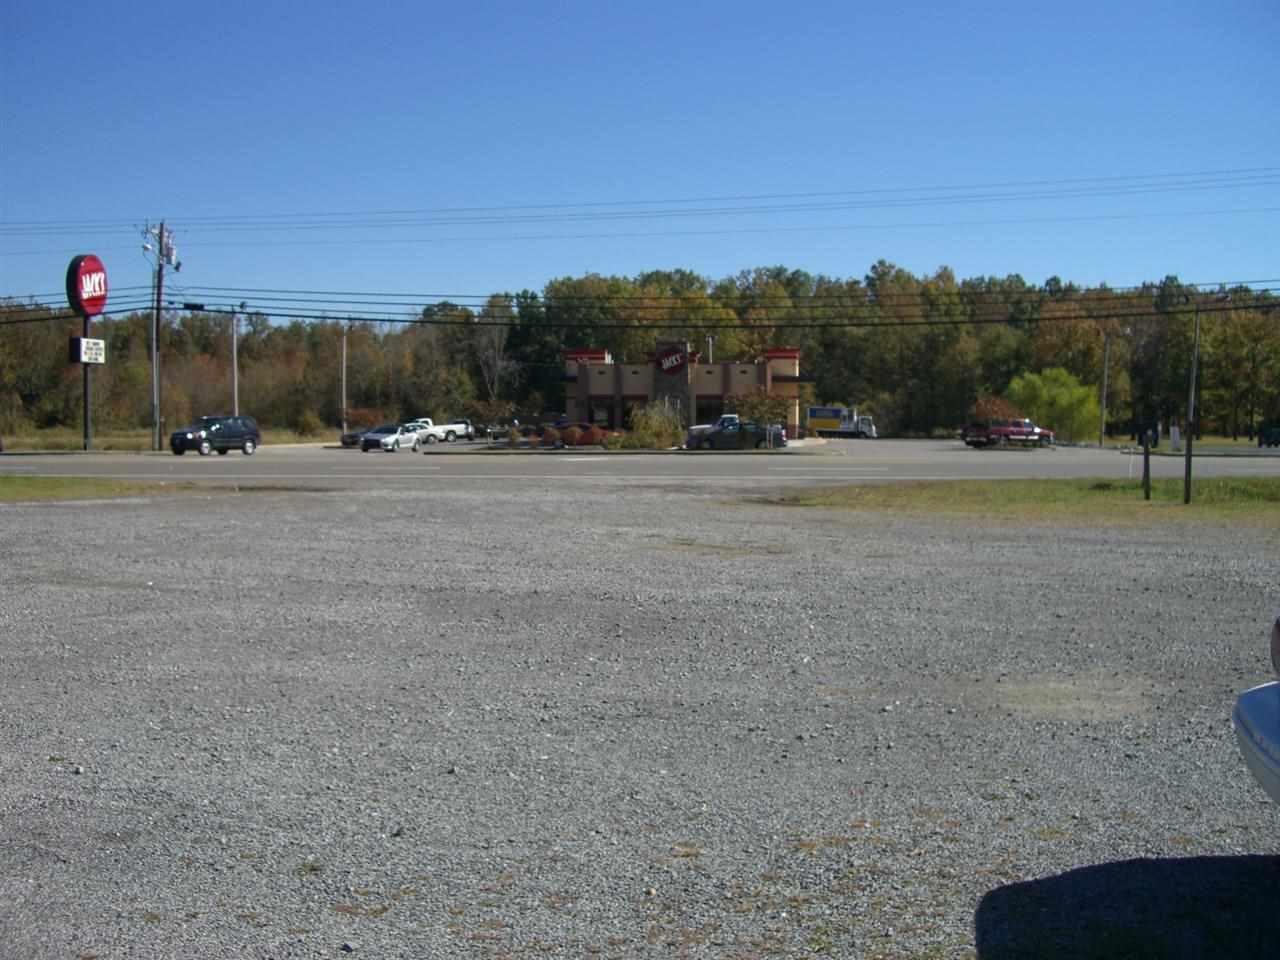 2904 S Broad St, Scottsboro AL 35768